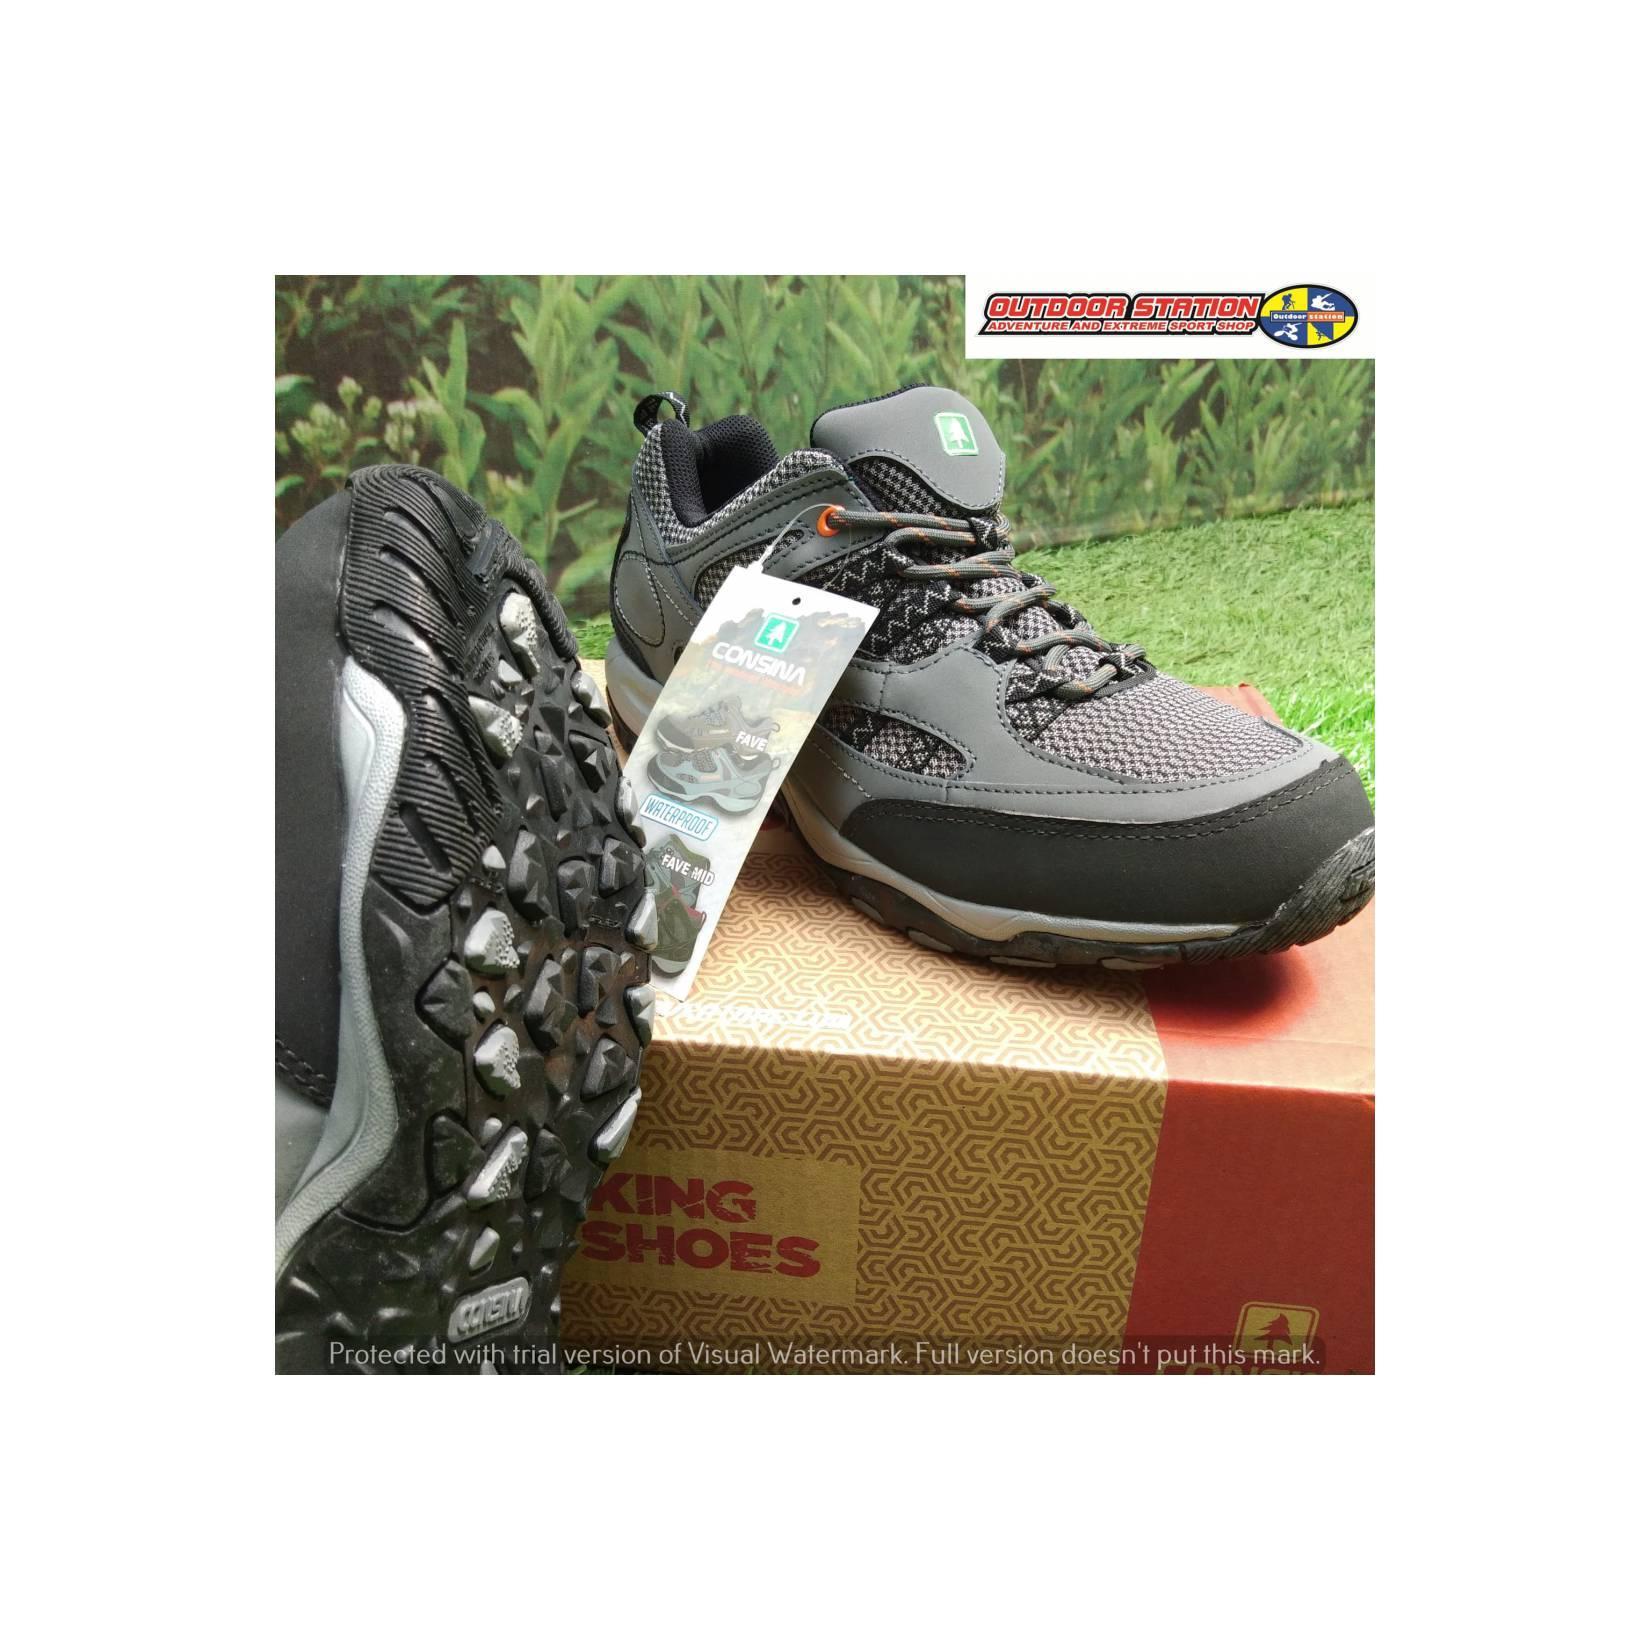 Sepatu Gunung Consina Pave Low Grey/Black Trekking Shoes